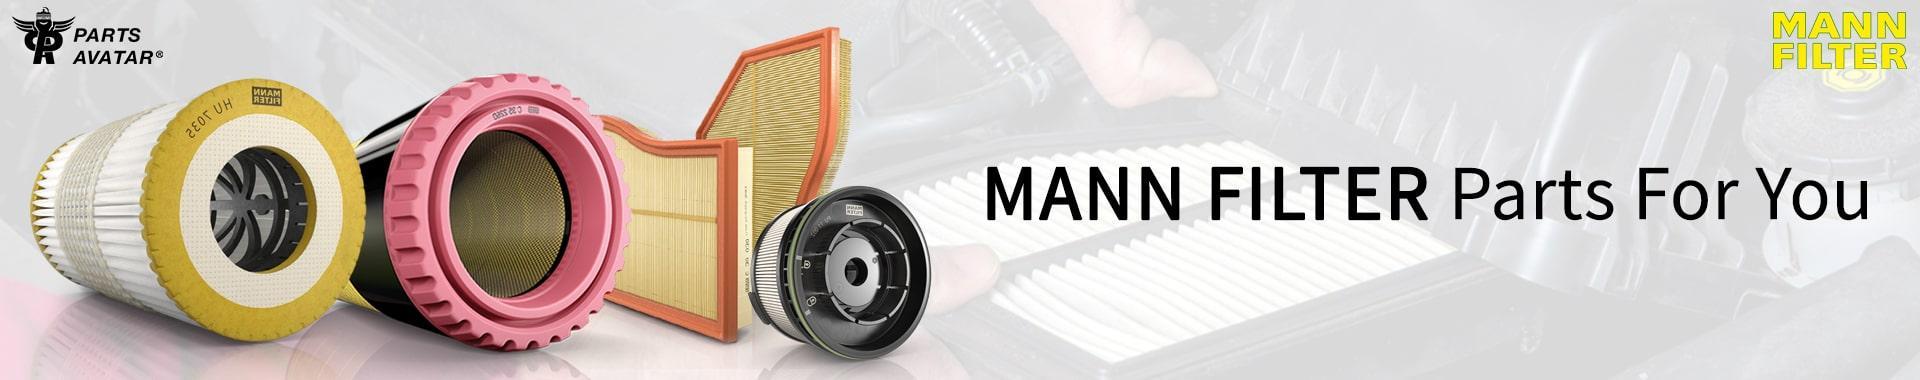 3.1. Mann Air Filter